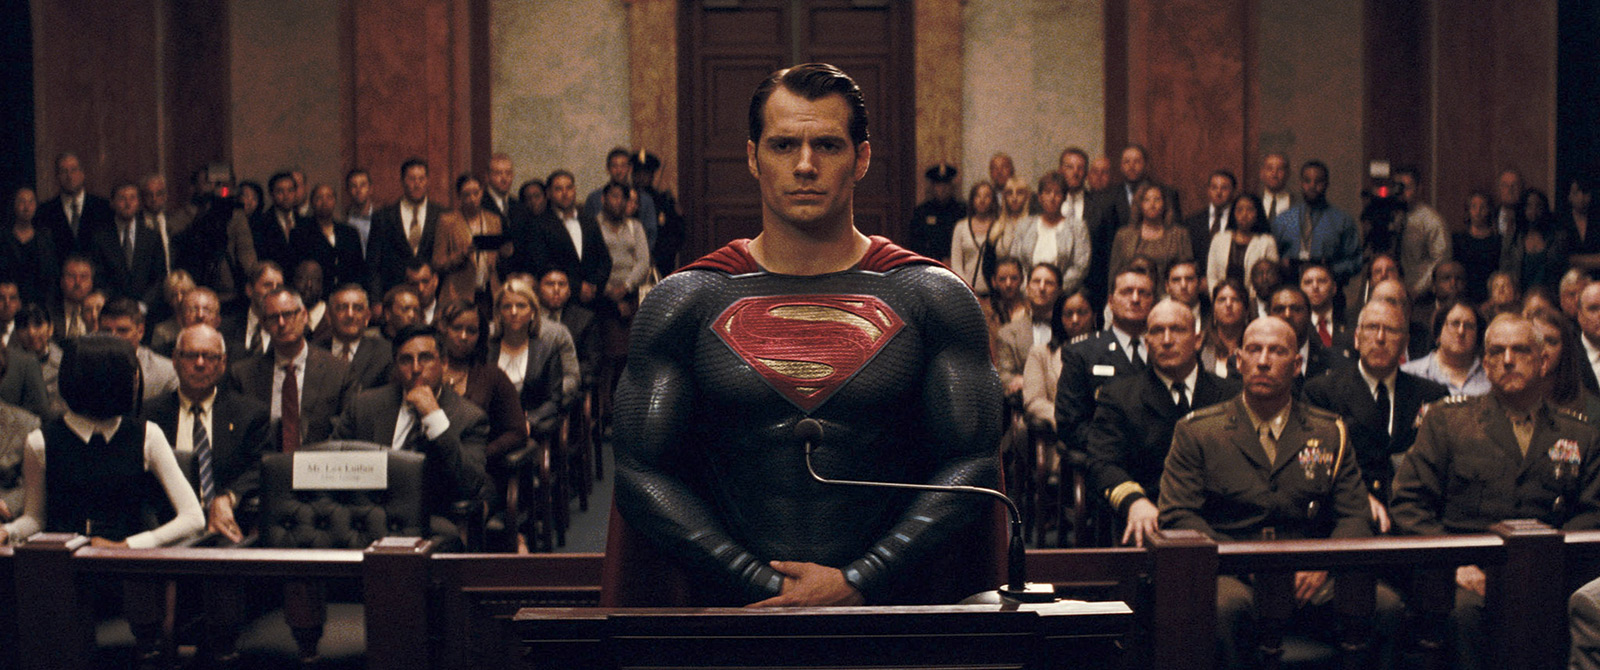 watch batman vs superman full movie online